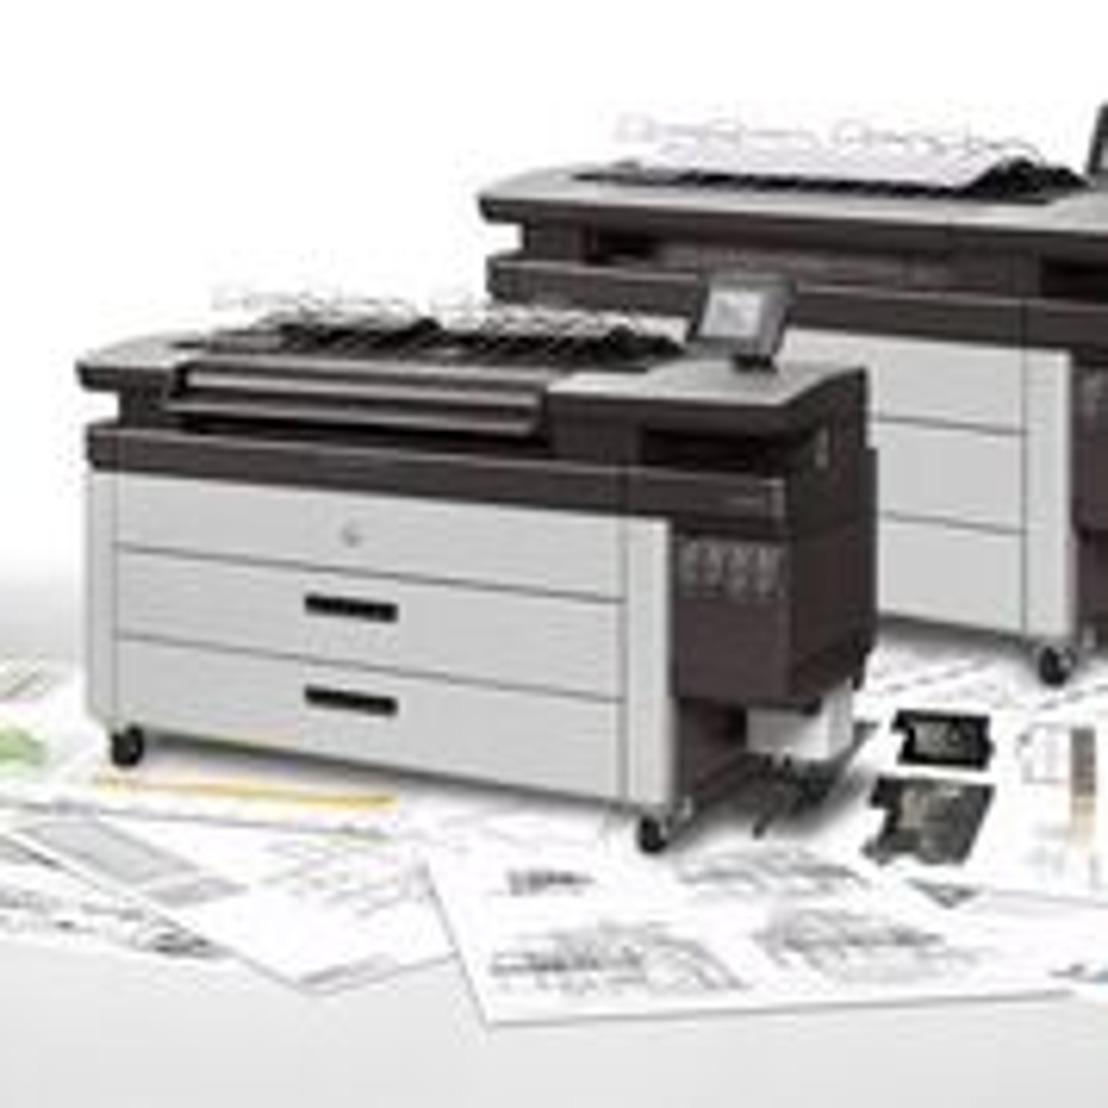 HP Debuts Comprehensive Design to Print Portfolio at Autodesk University 2018